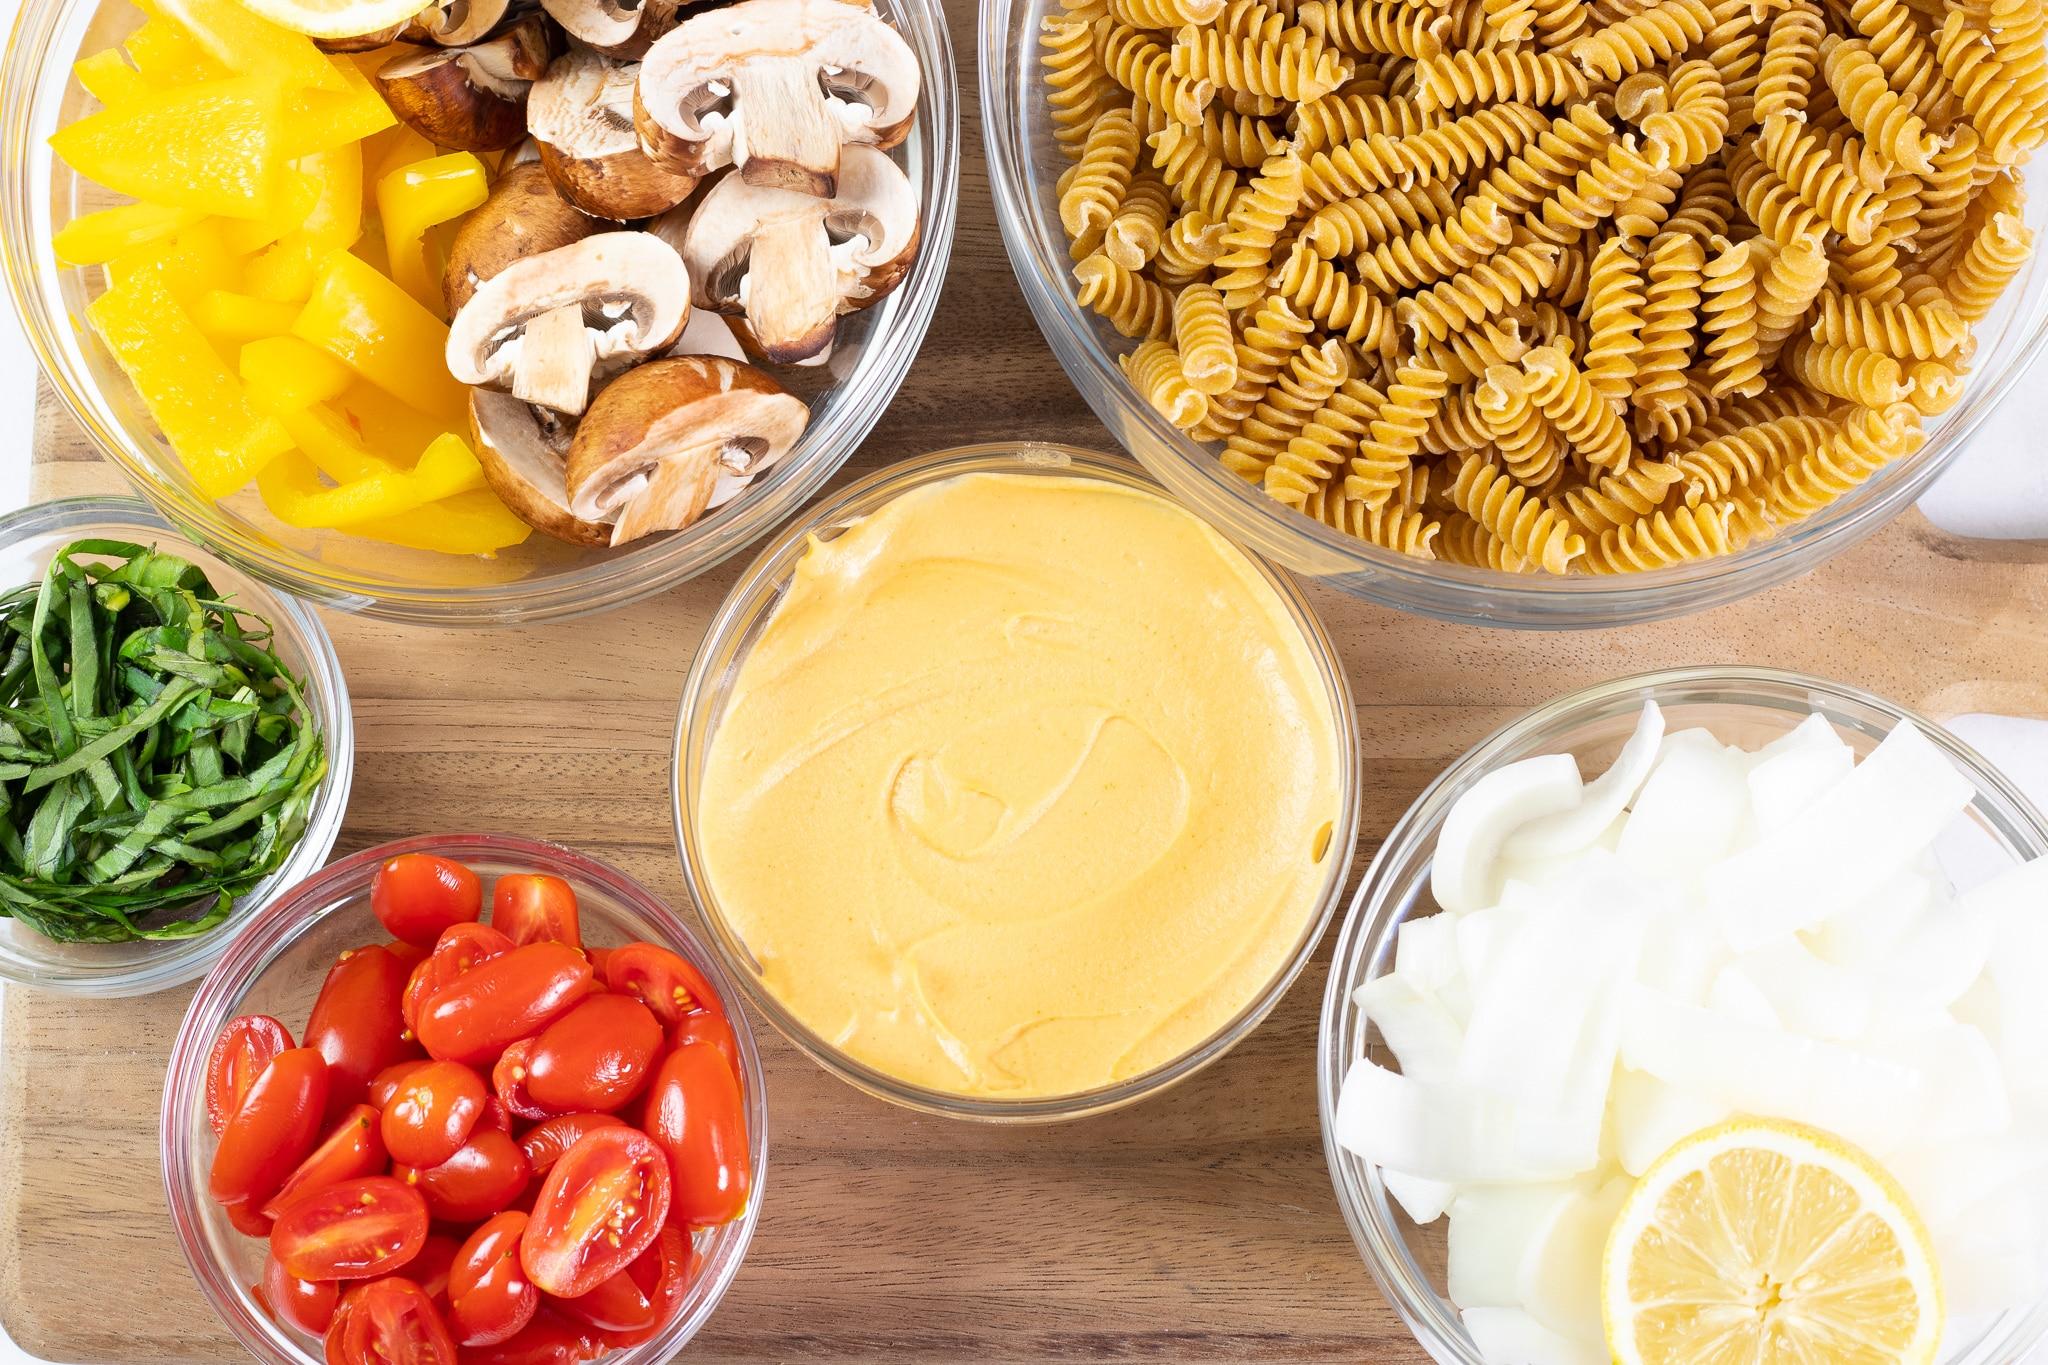 Hummus Pasta Salad Ingredients